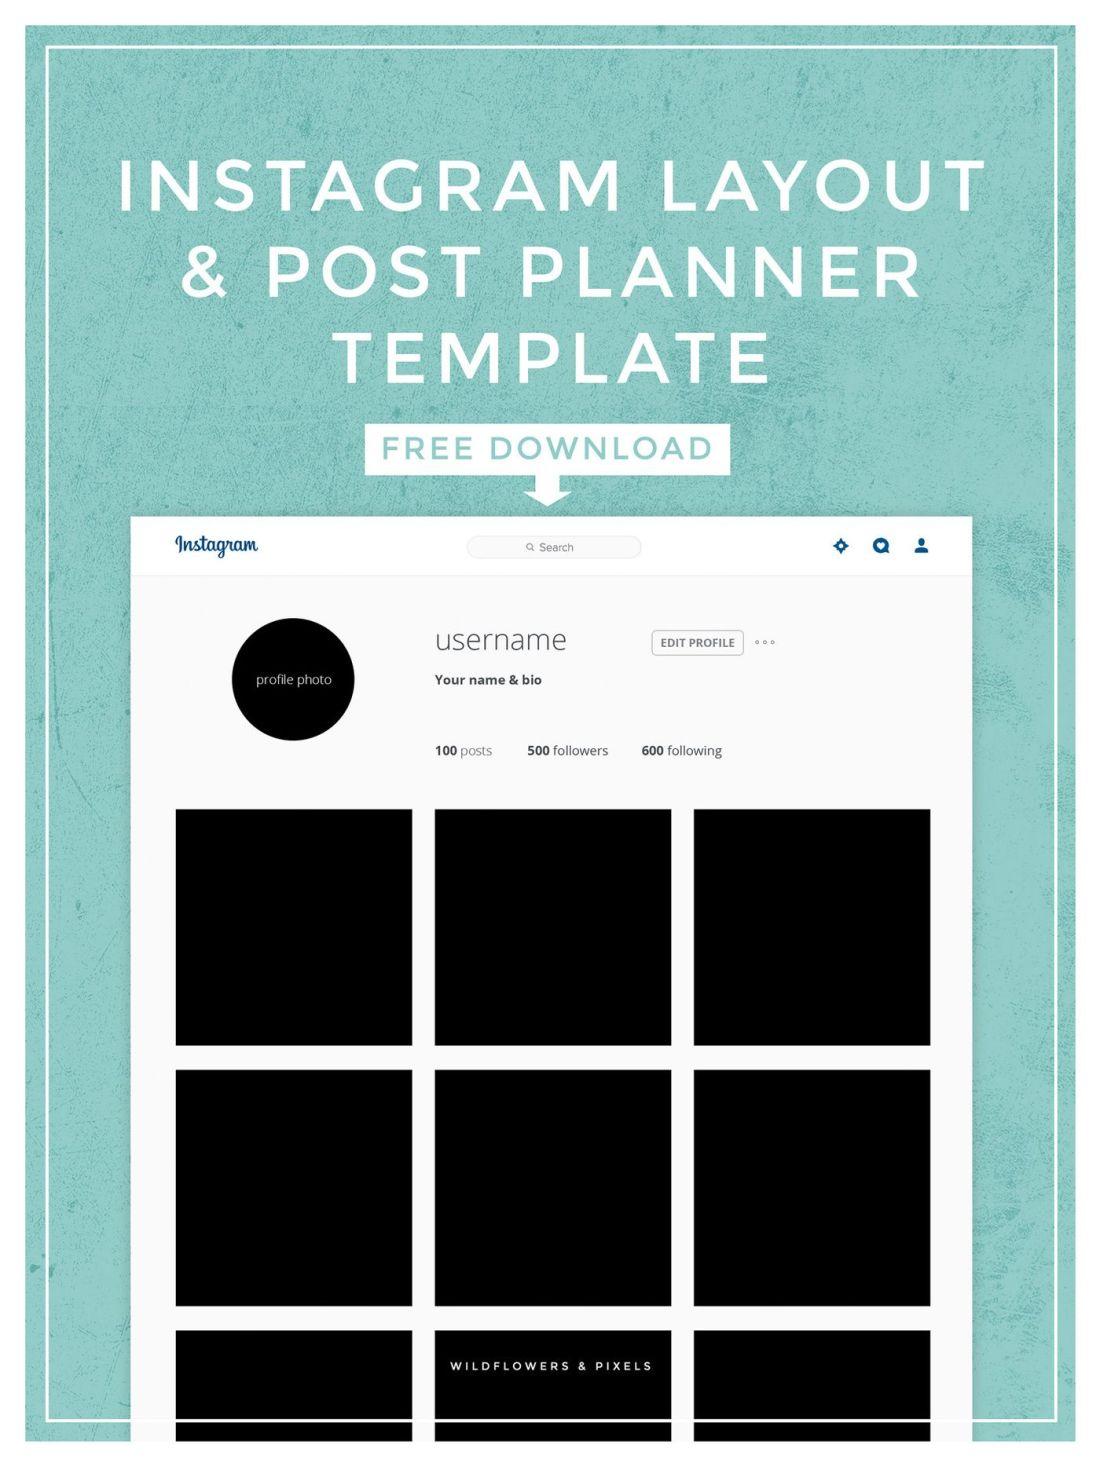 Instagram layout post planner template planner